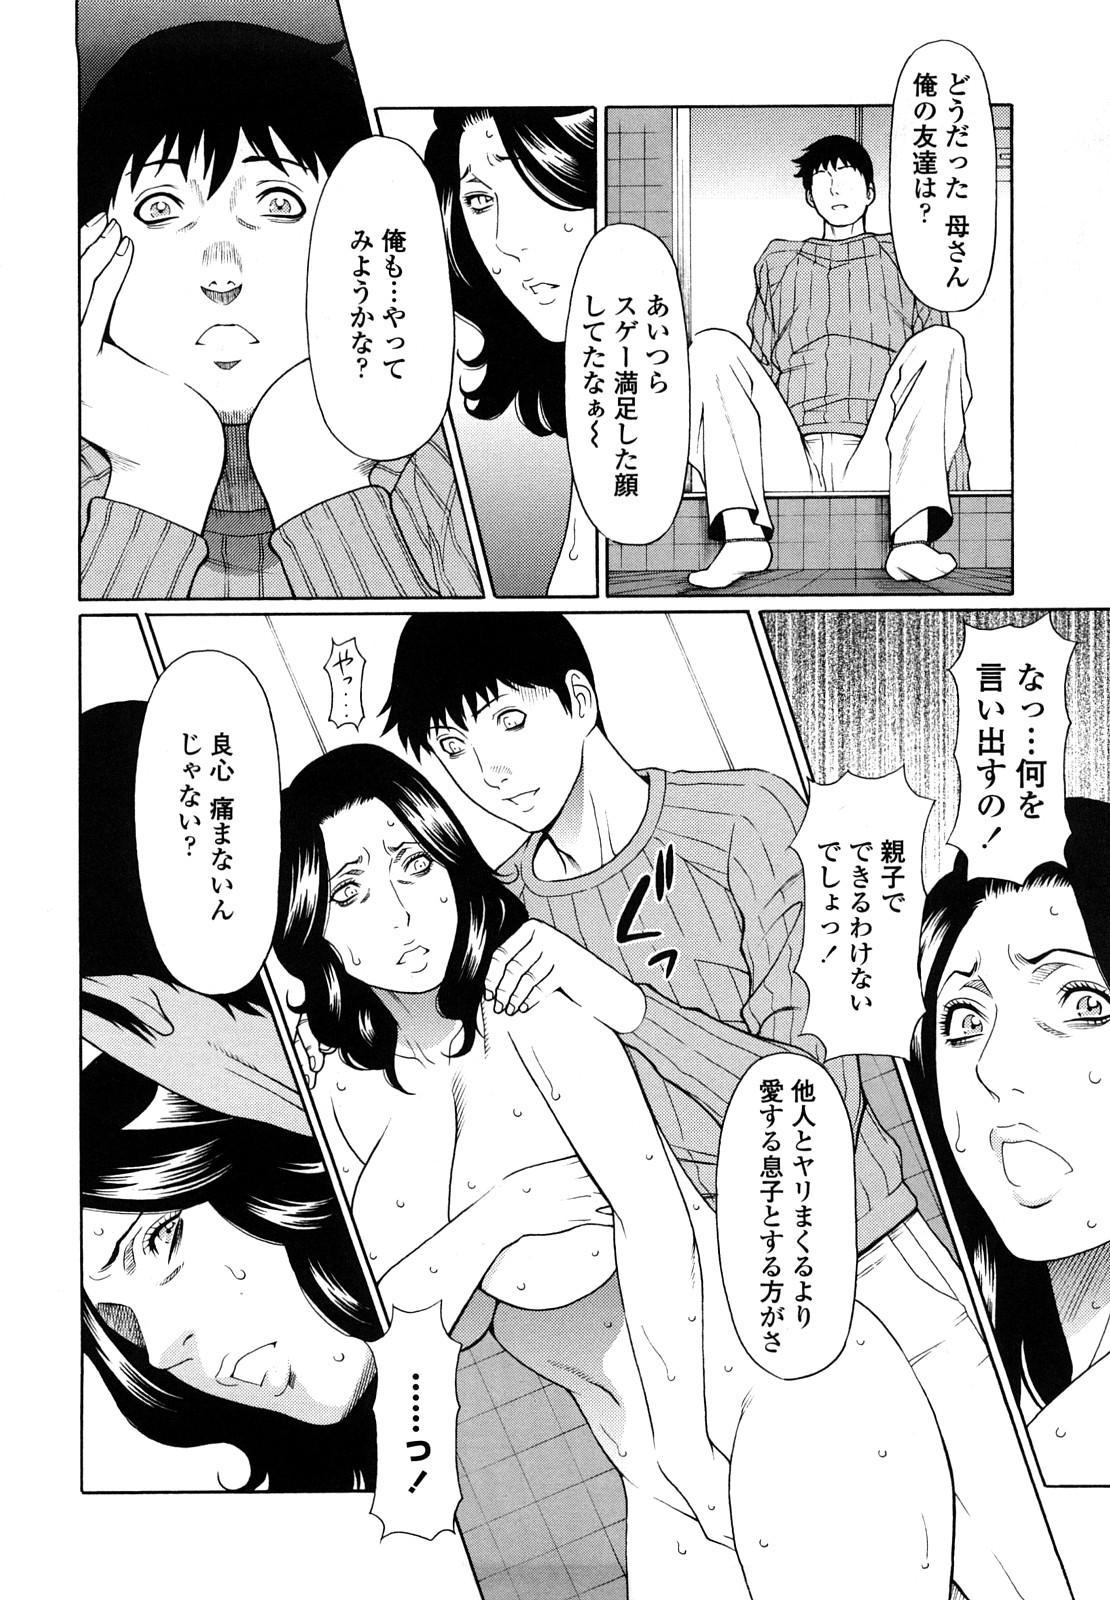 [Takasugi Kou] Kindan no Haha-Ana - Immorality Love-Hole [Decensored] 9